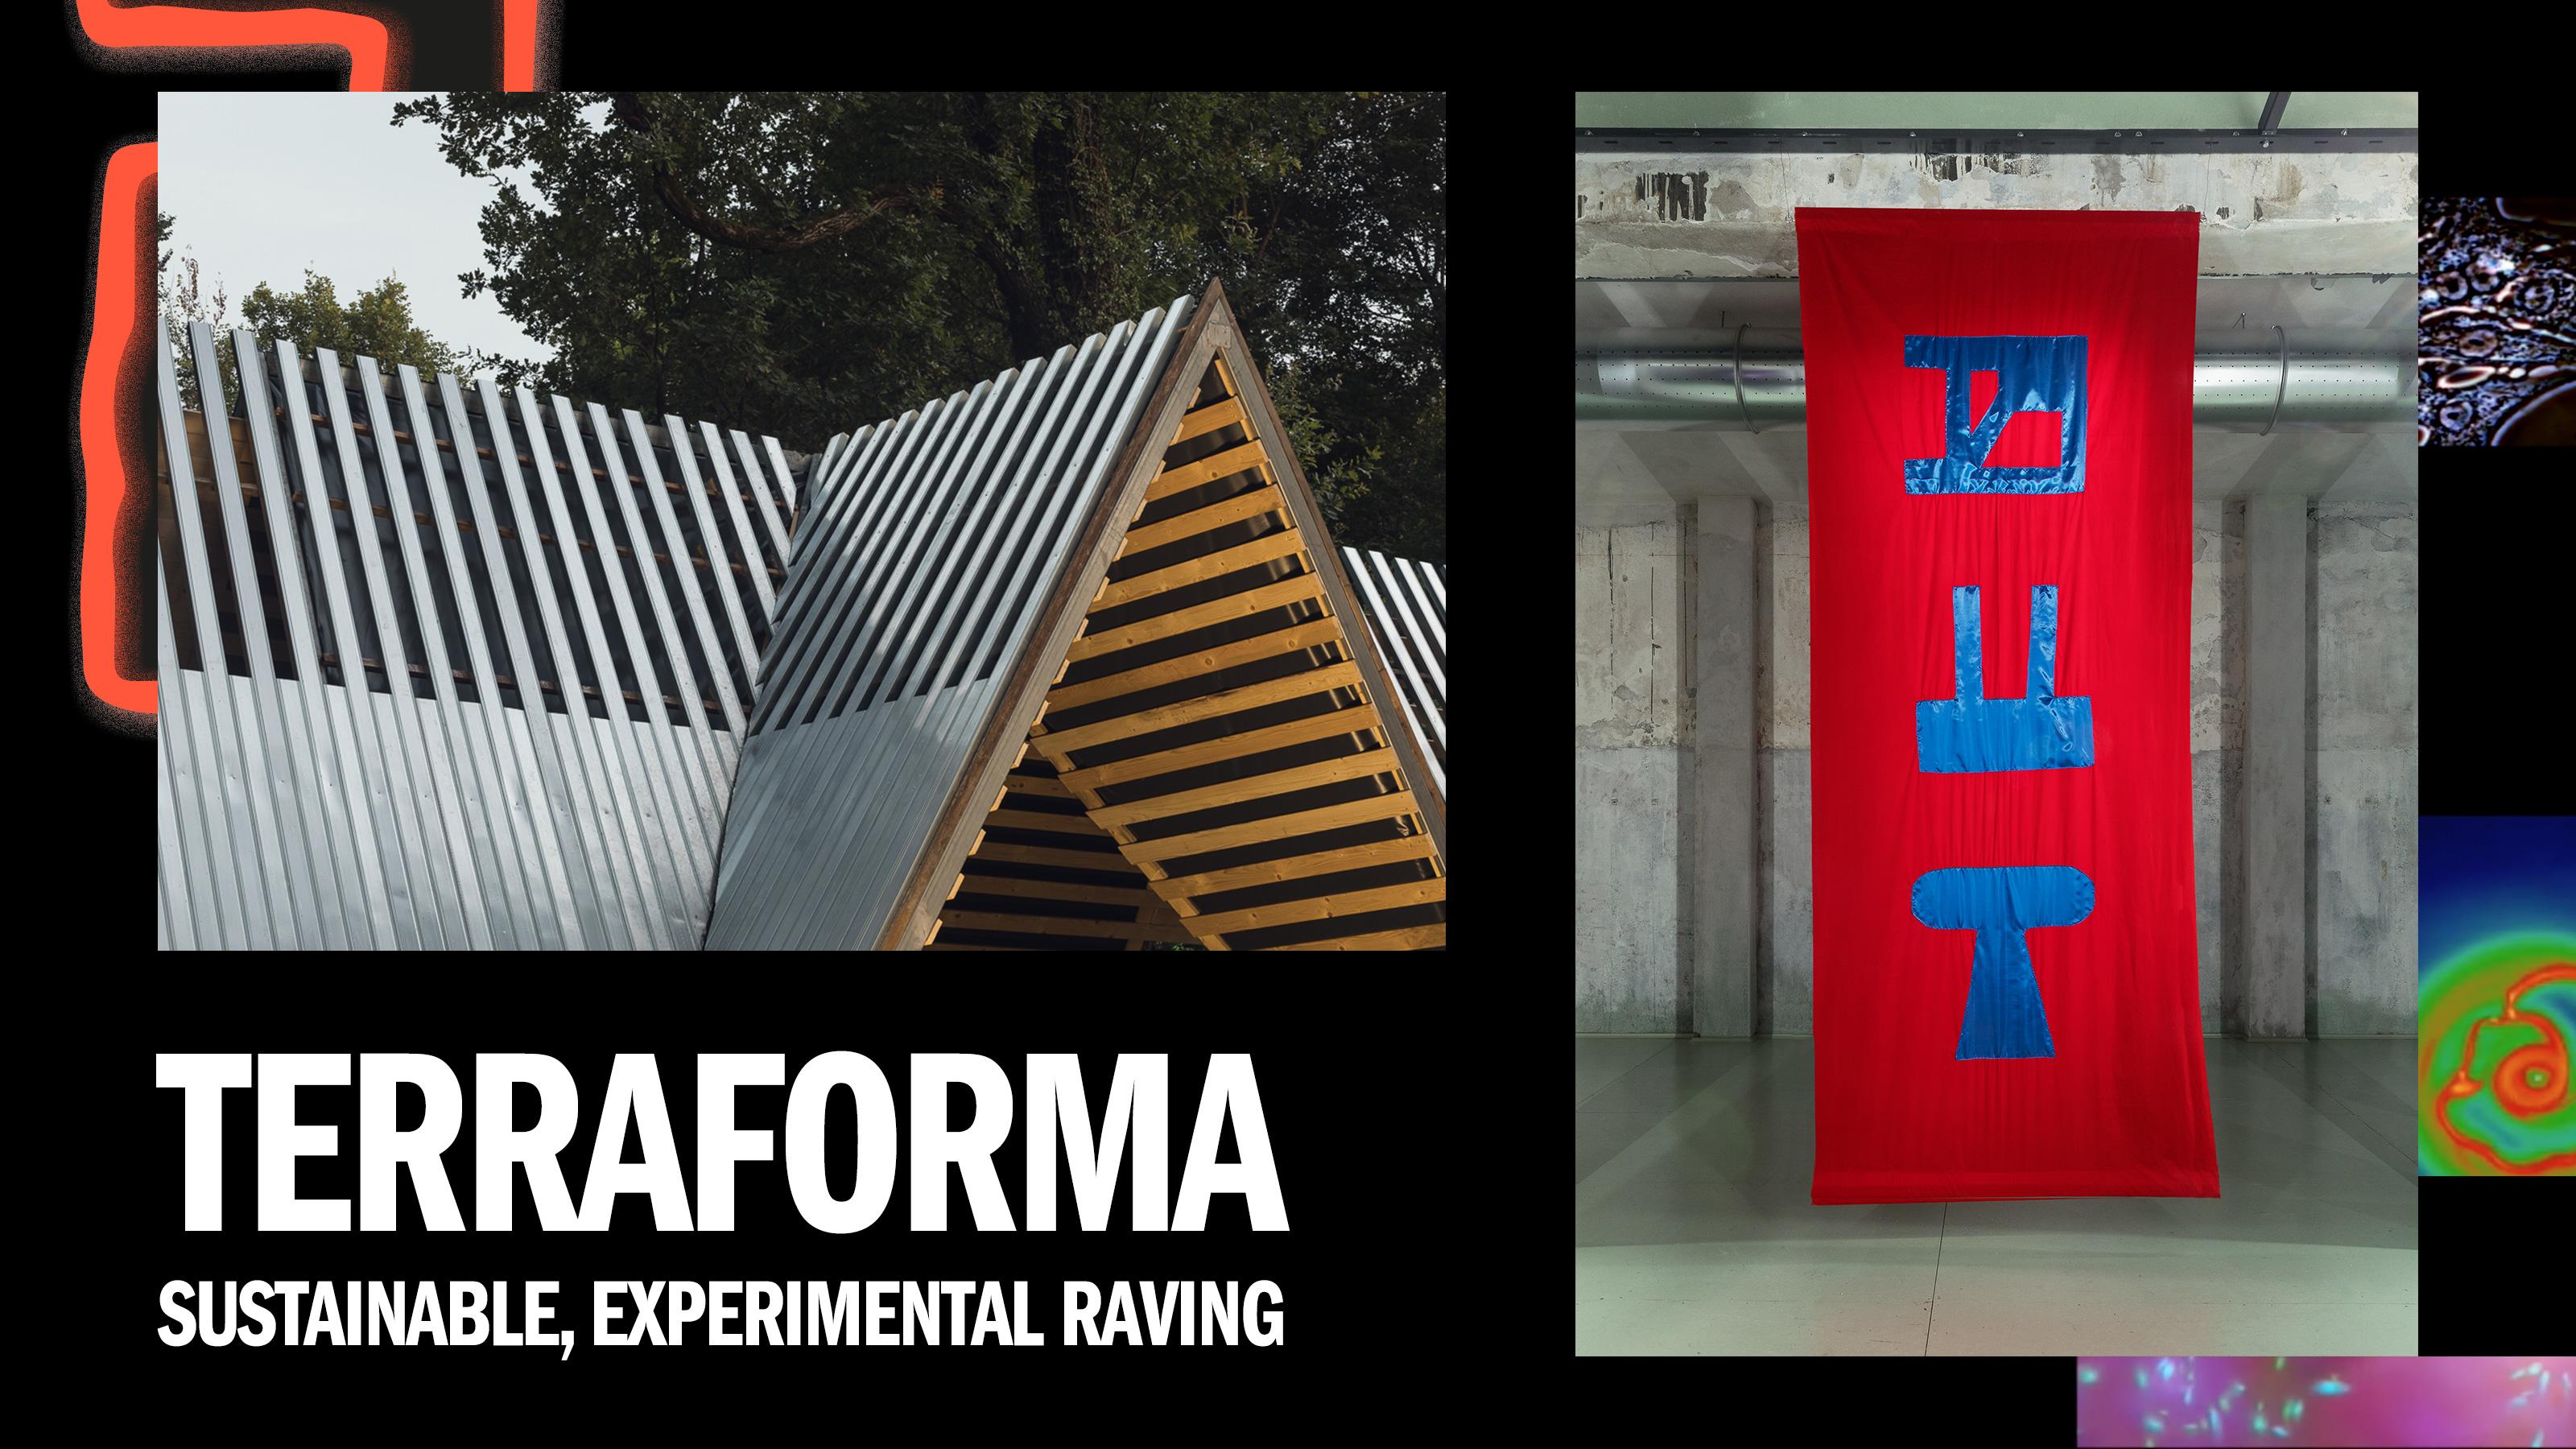 Terraforma festival: Sustainable, experimental raving